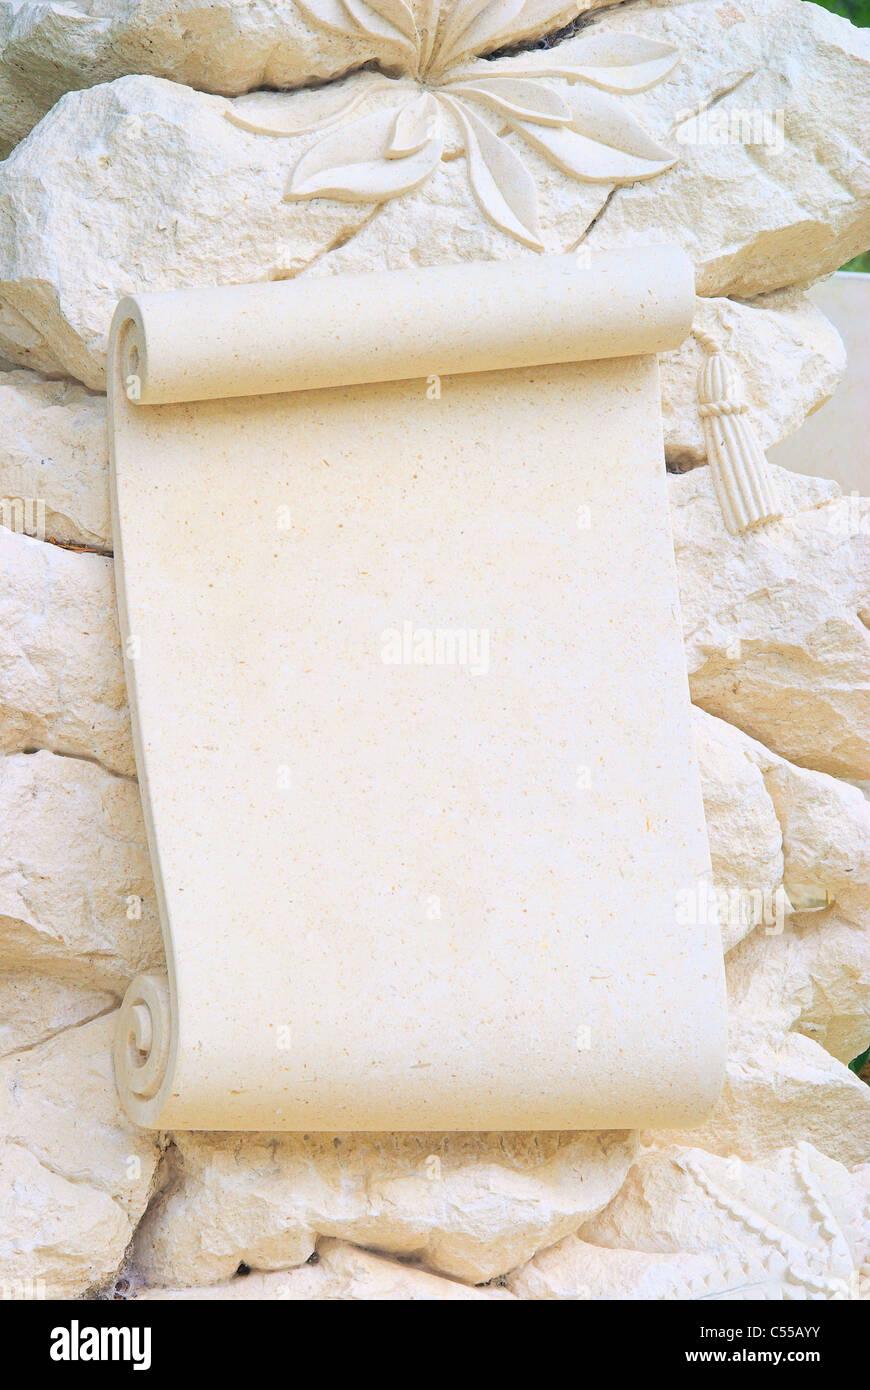 Marmor Tafel - marmo pell 01 Immagini Stock